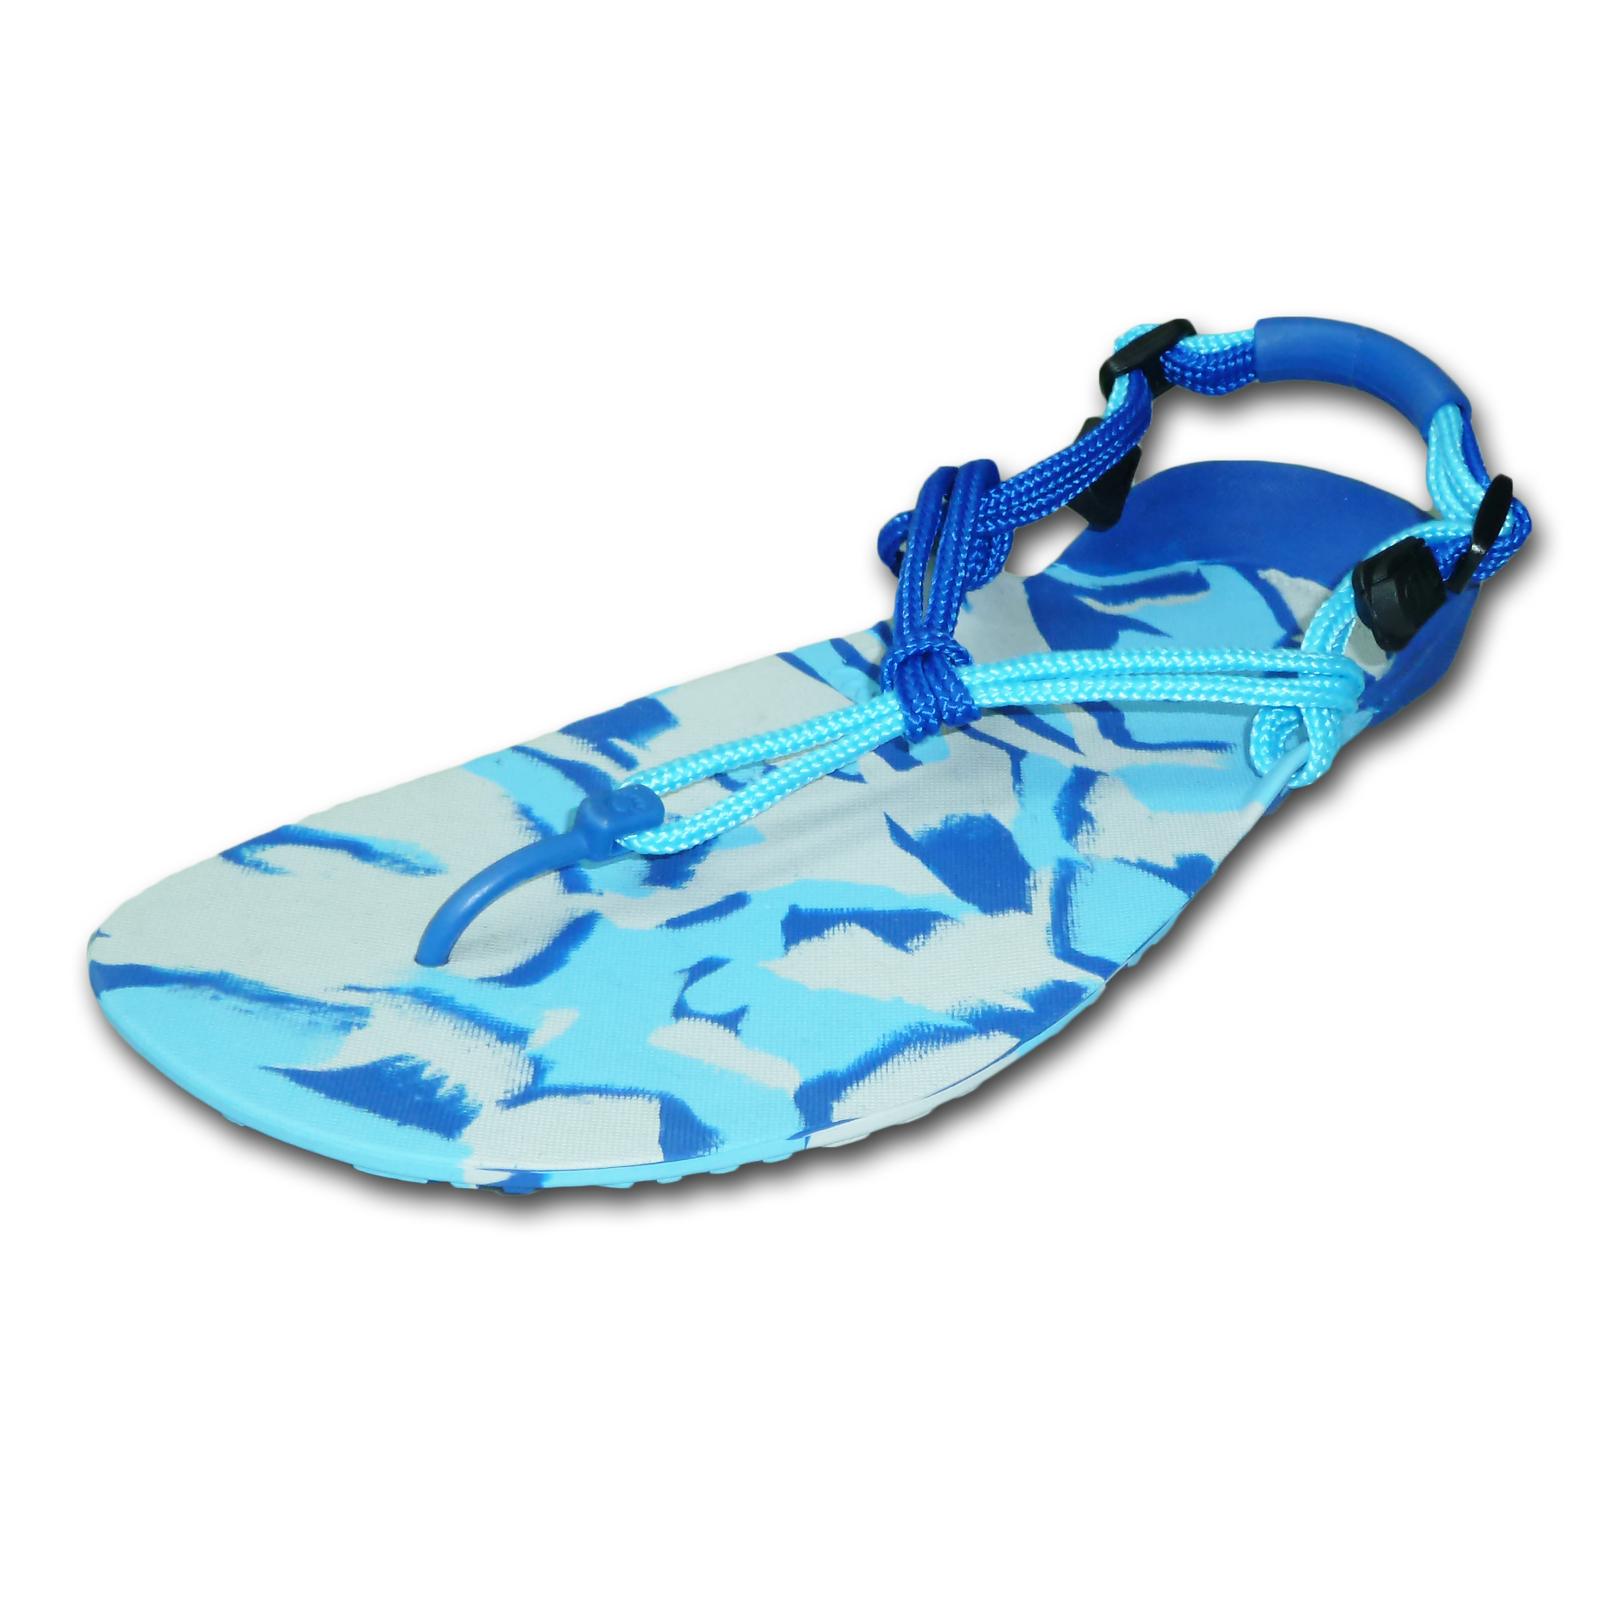 Xero Shoes Ocean Camo Barefoot Running Sandal